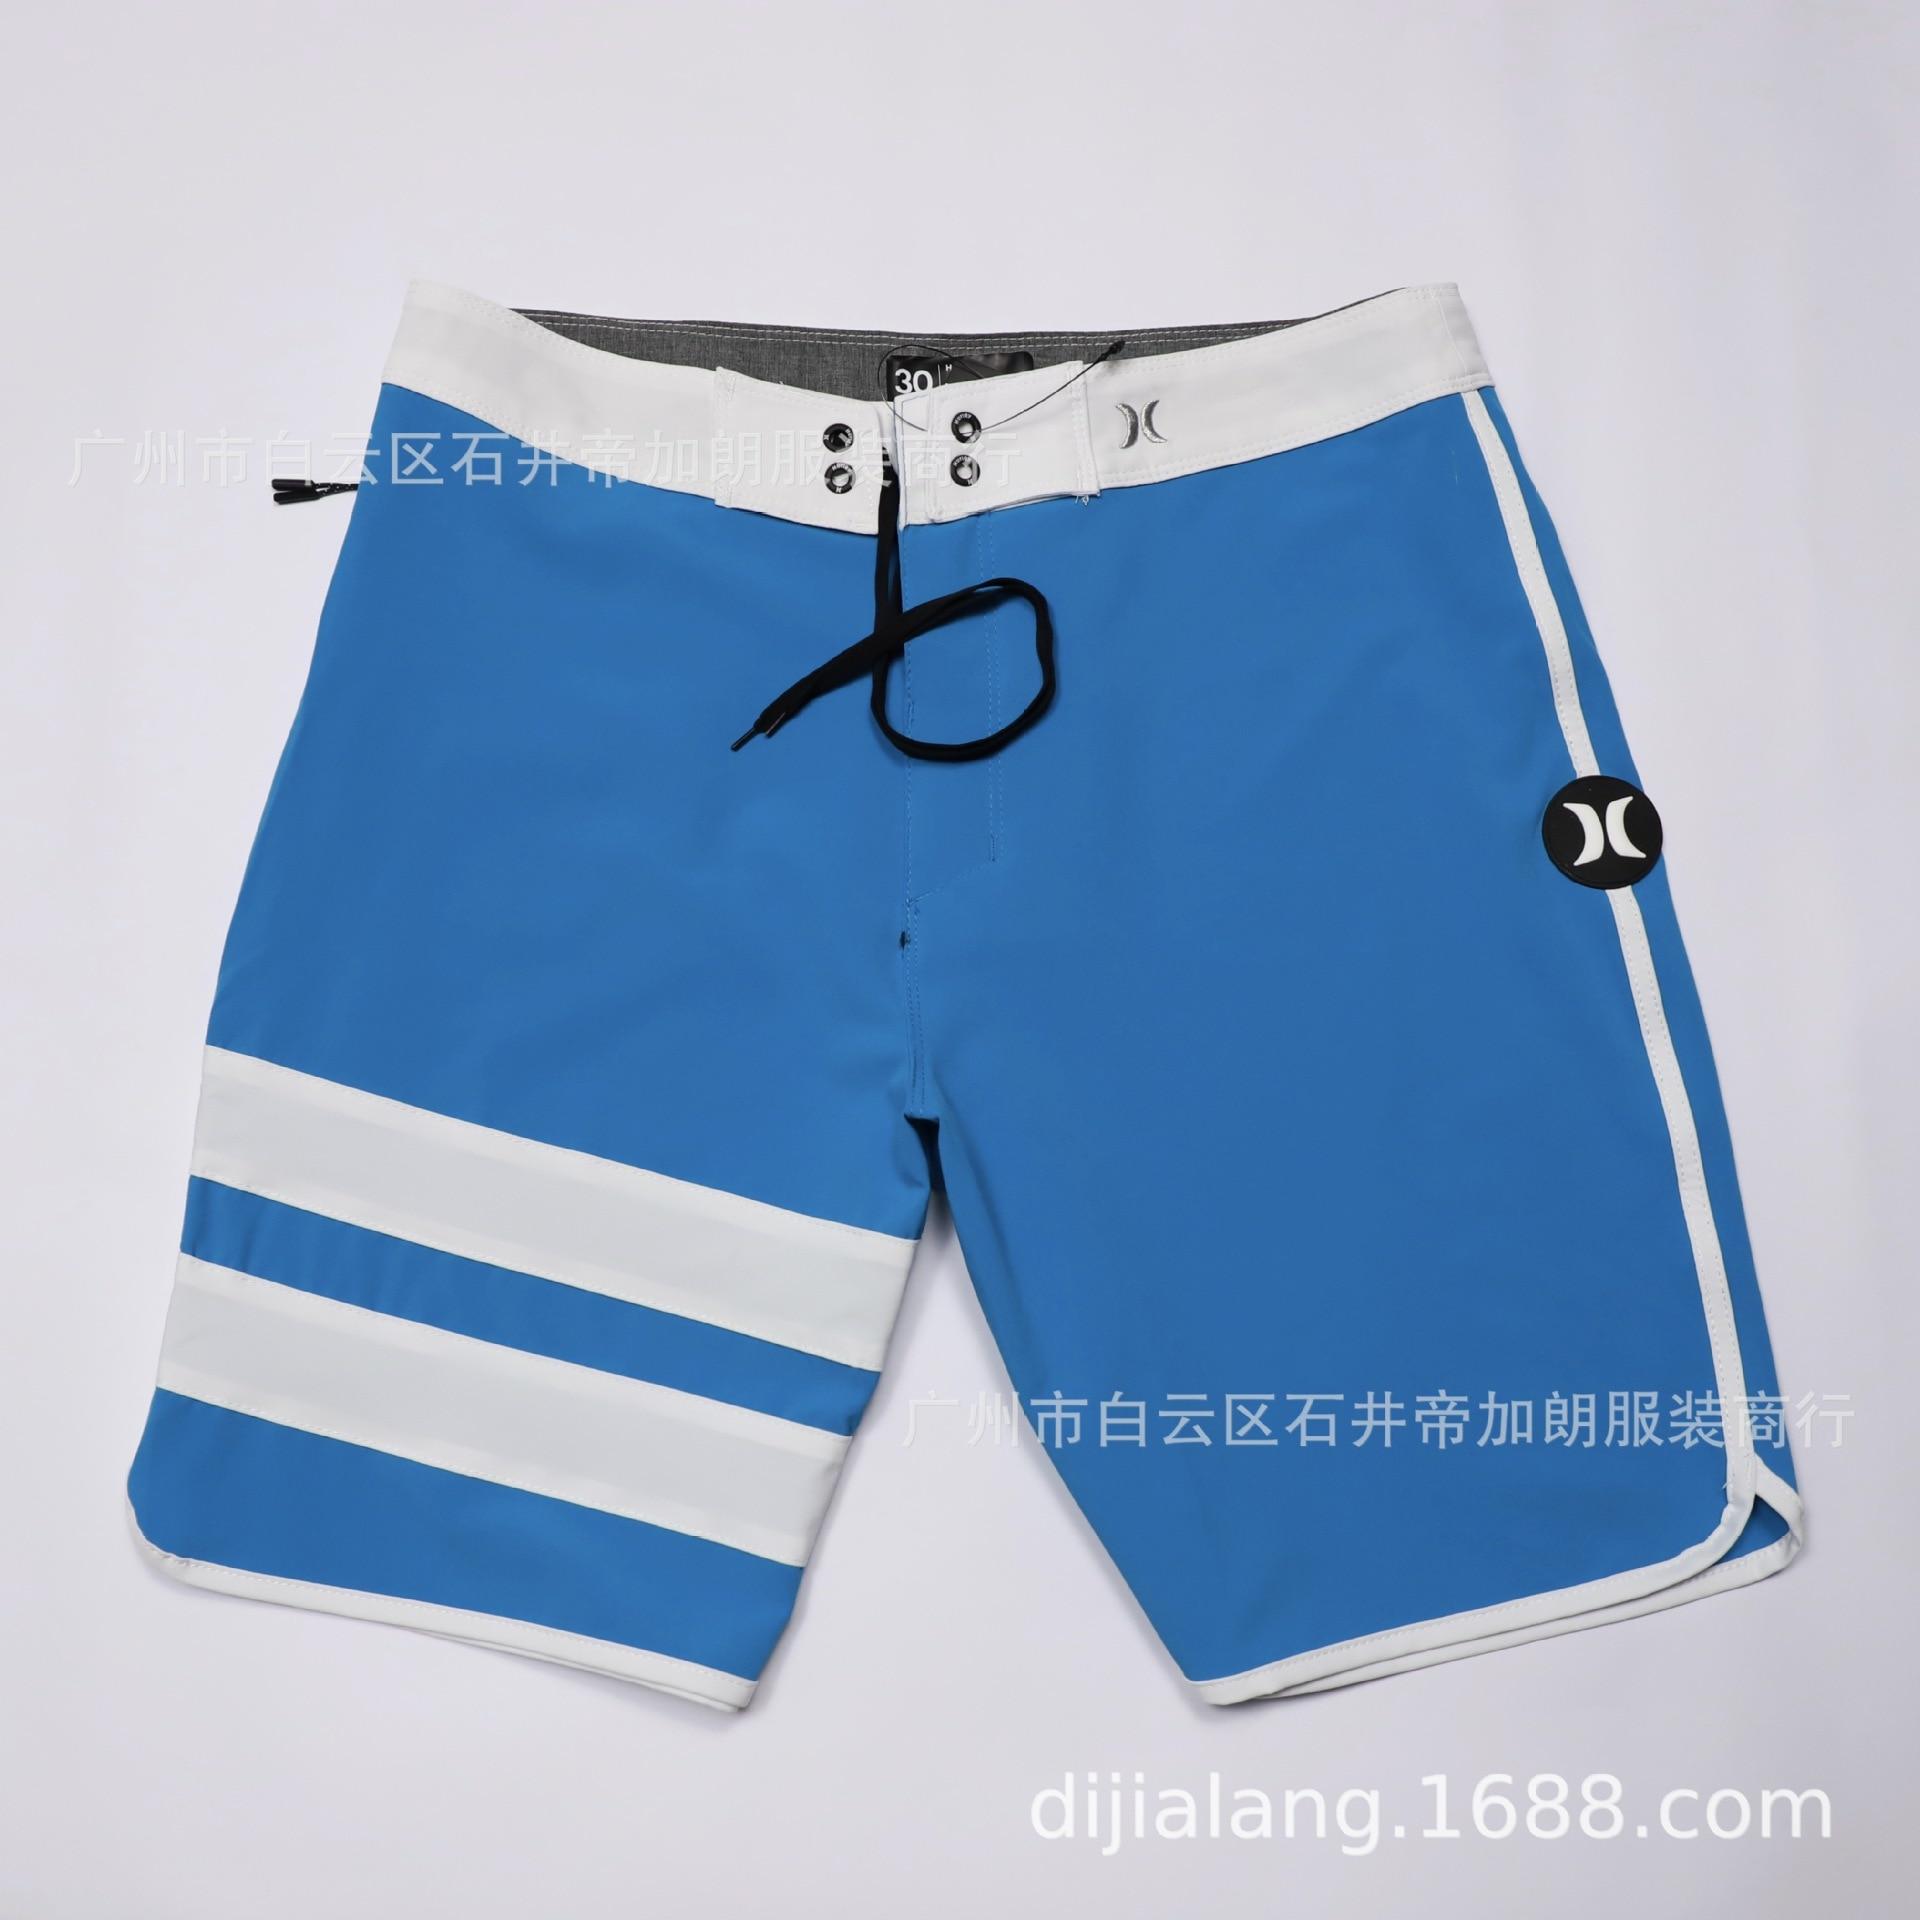 2019 New Style Quick-Dry MEN'S Beach Pants Men's Elasticity Shorts Short Waterproof Large Size Boardshort